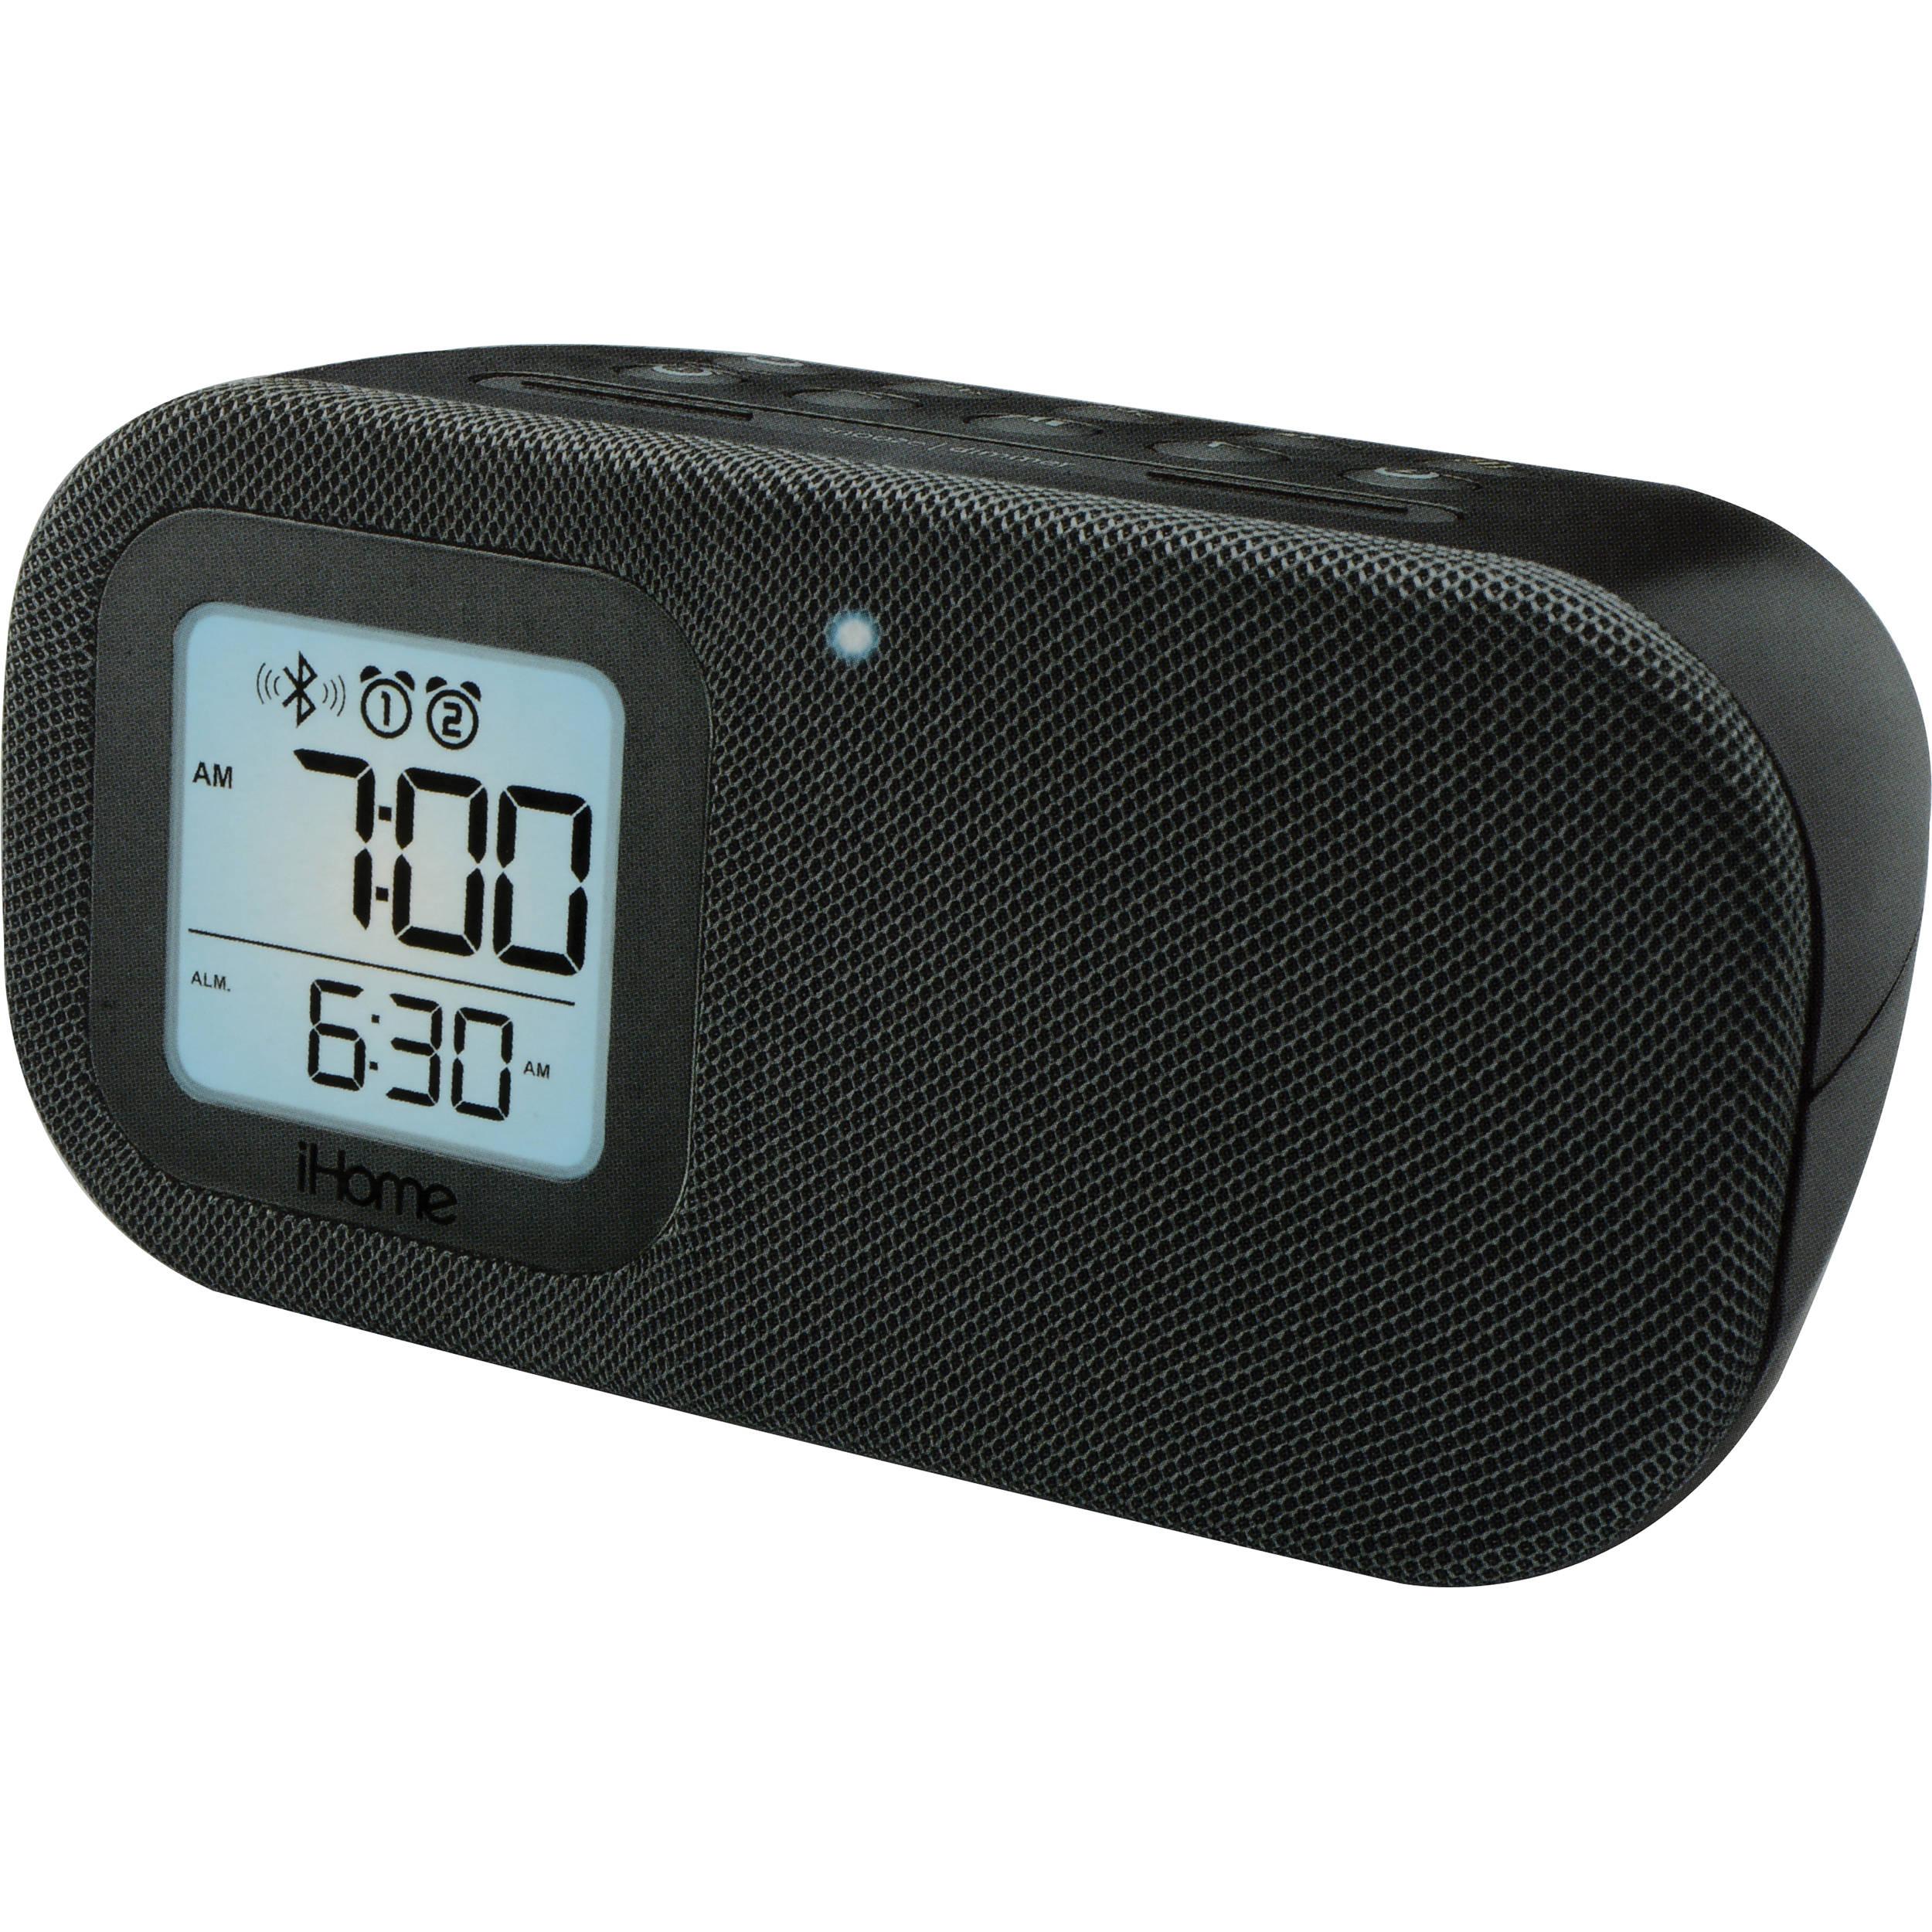 b57b694e7f1 Used iHome iBT21 Bluetooth Bedside Dual Alarm Clock IBT21BC B H